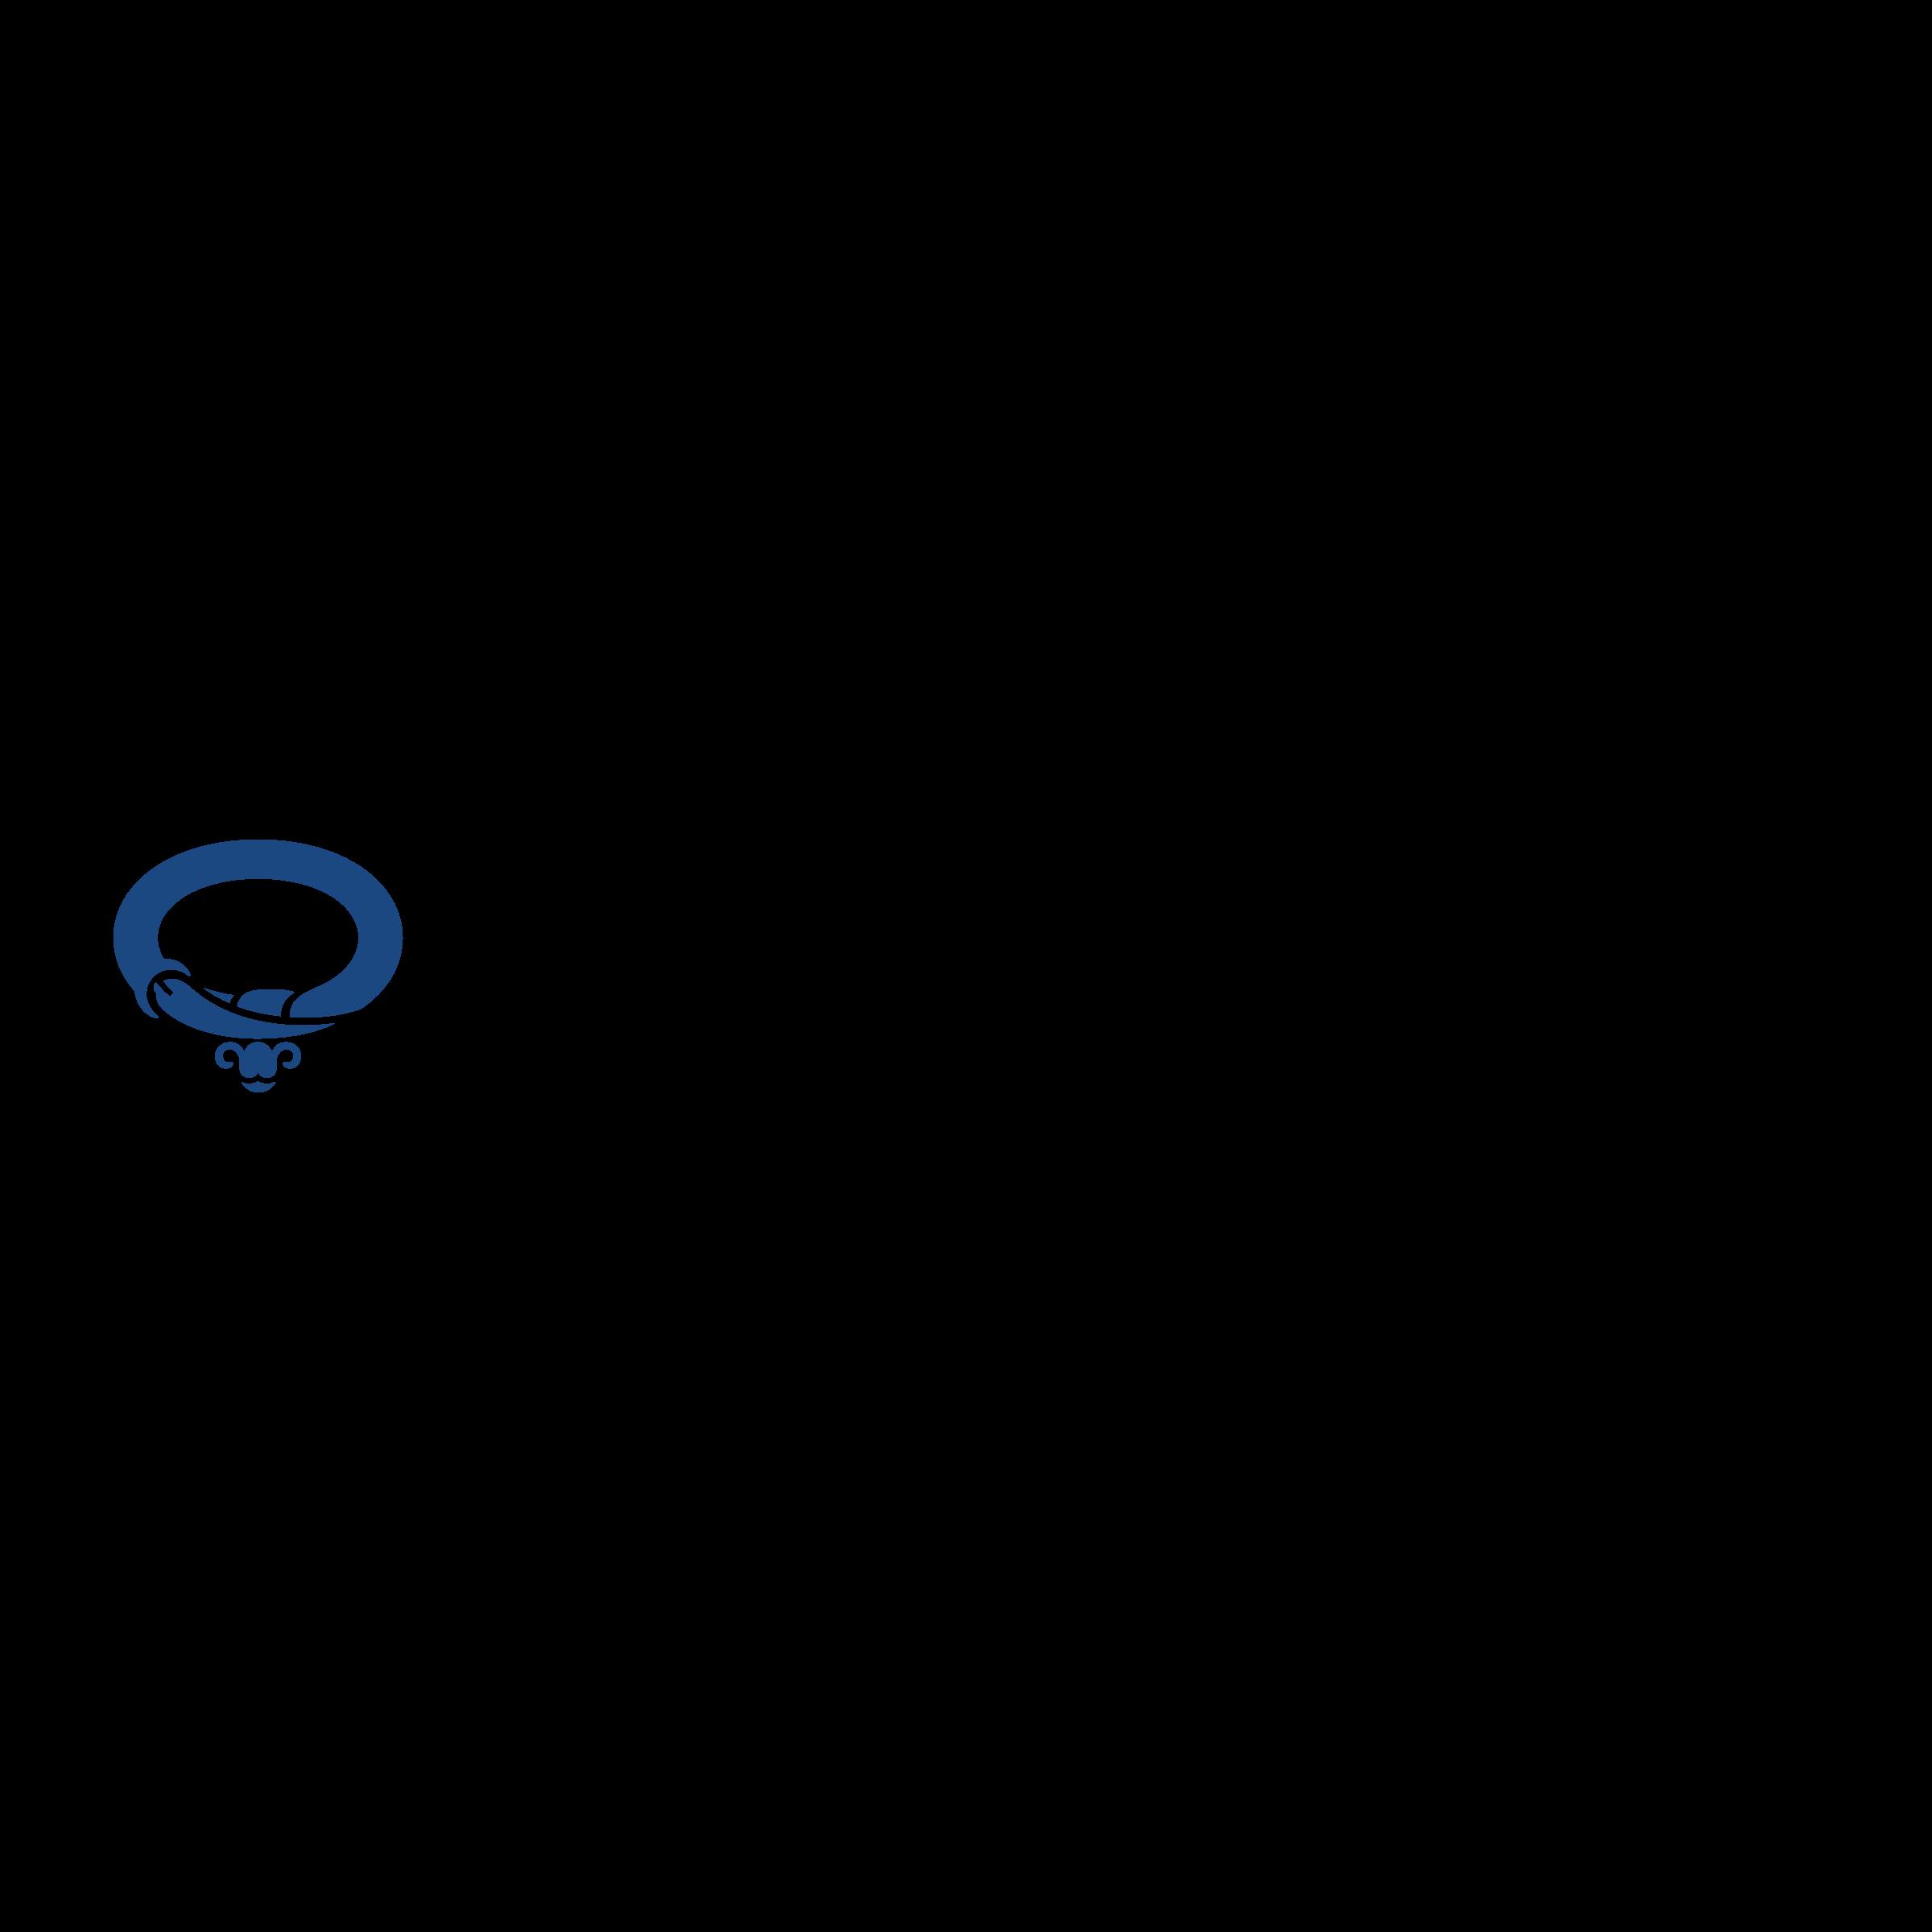 Ashurst Morris Crisp Logo PNG Transparent & SVG Vector.